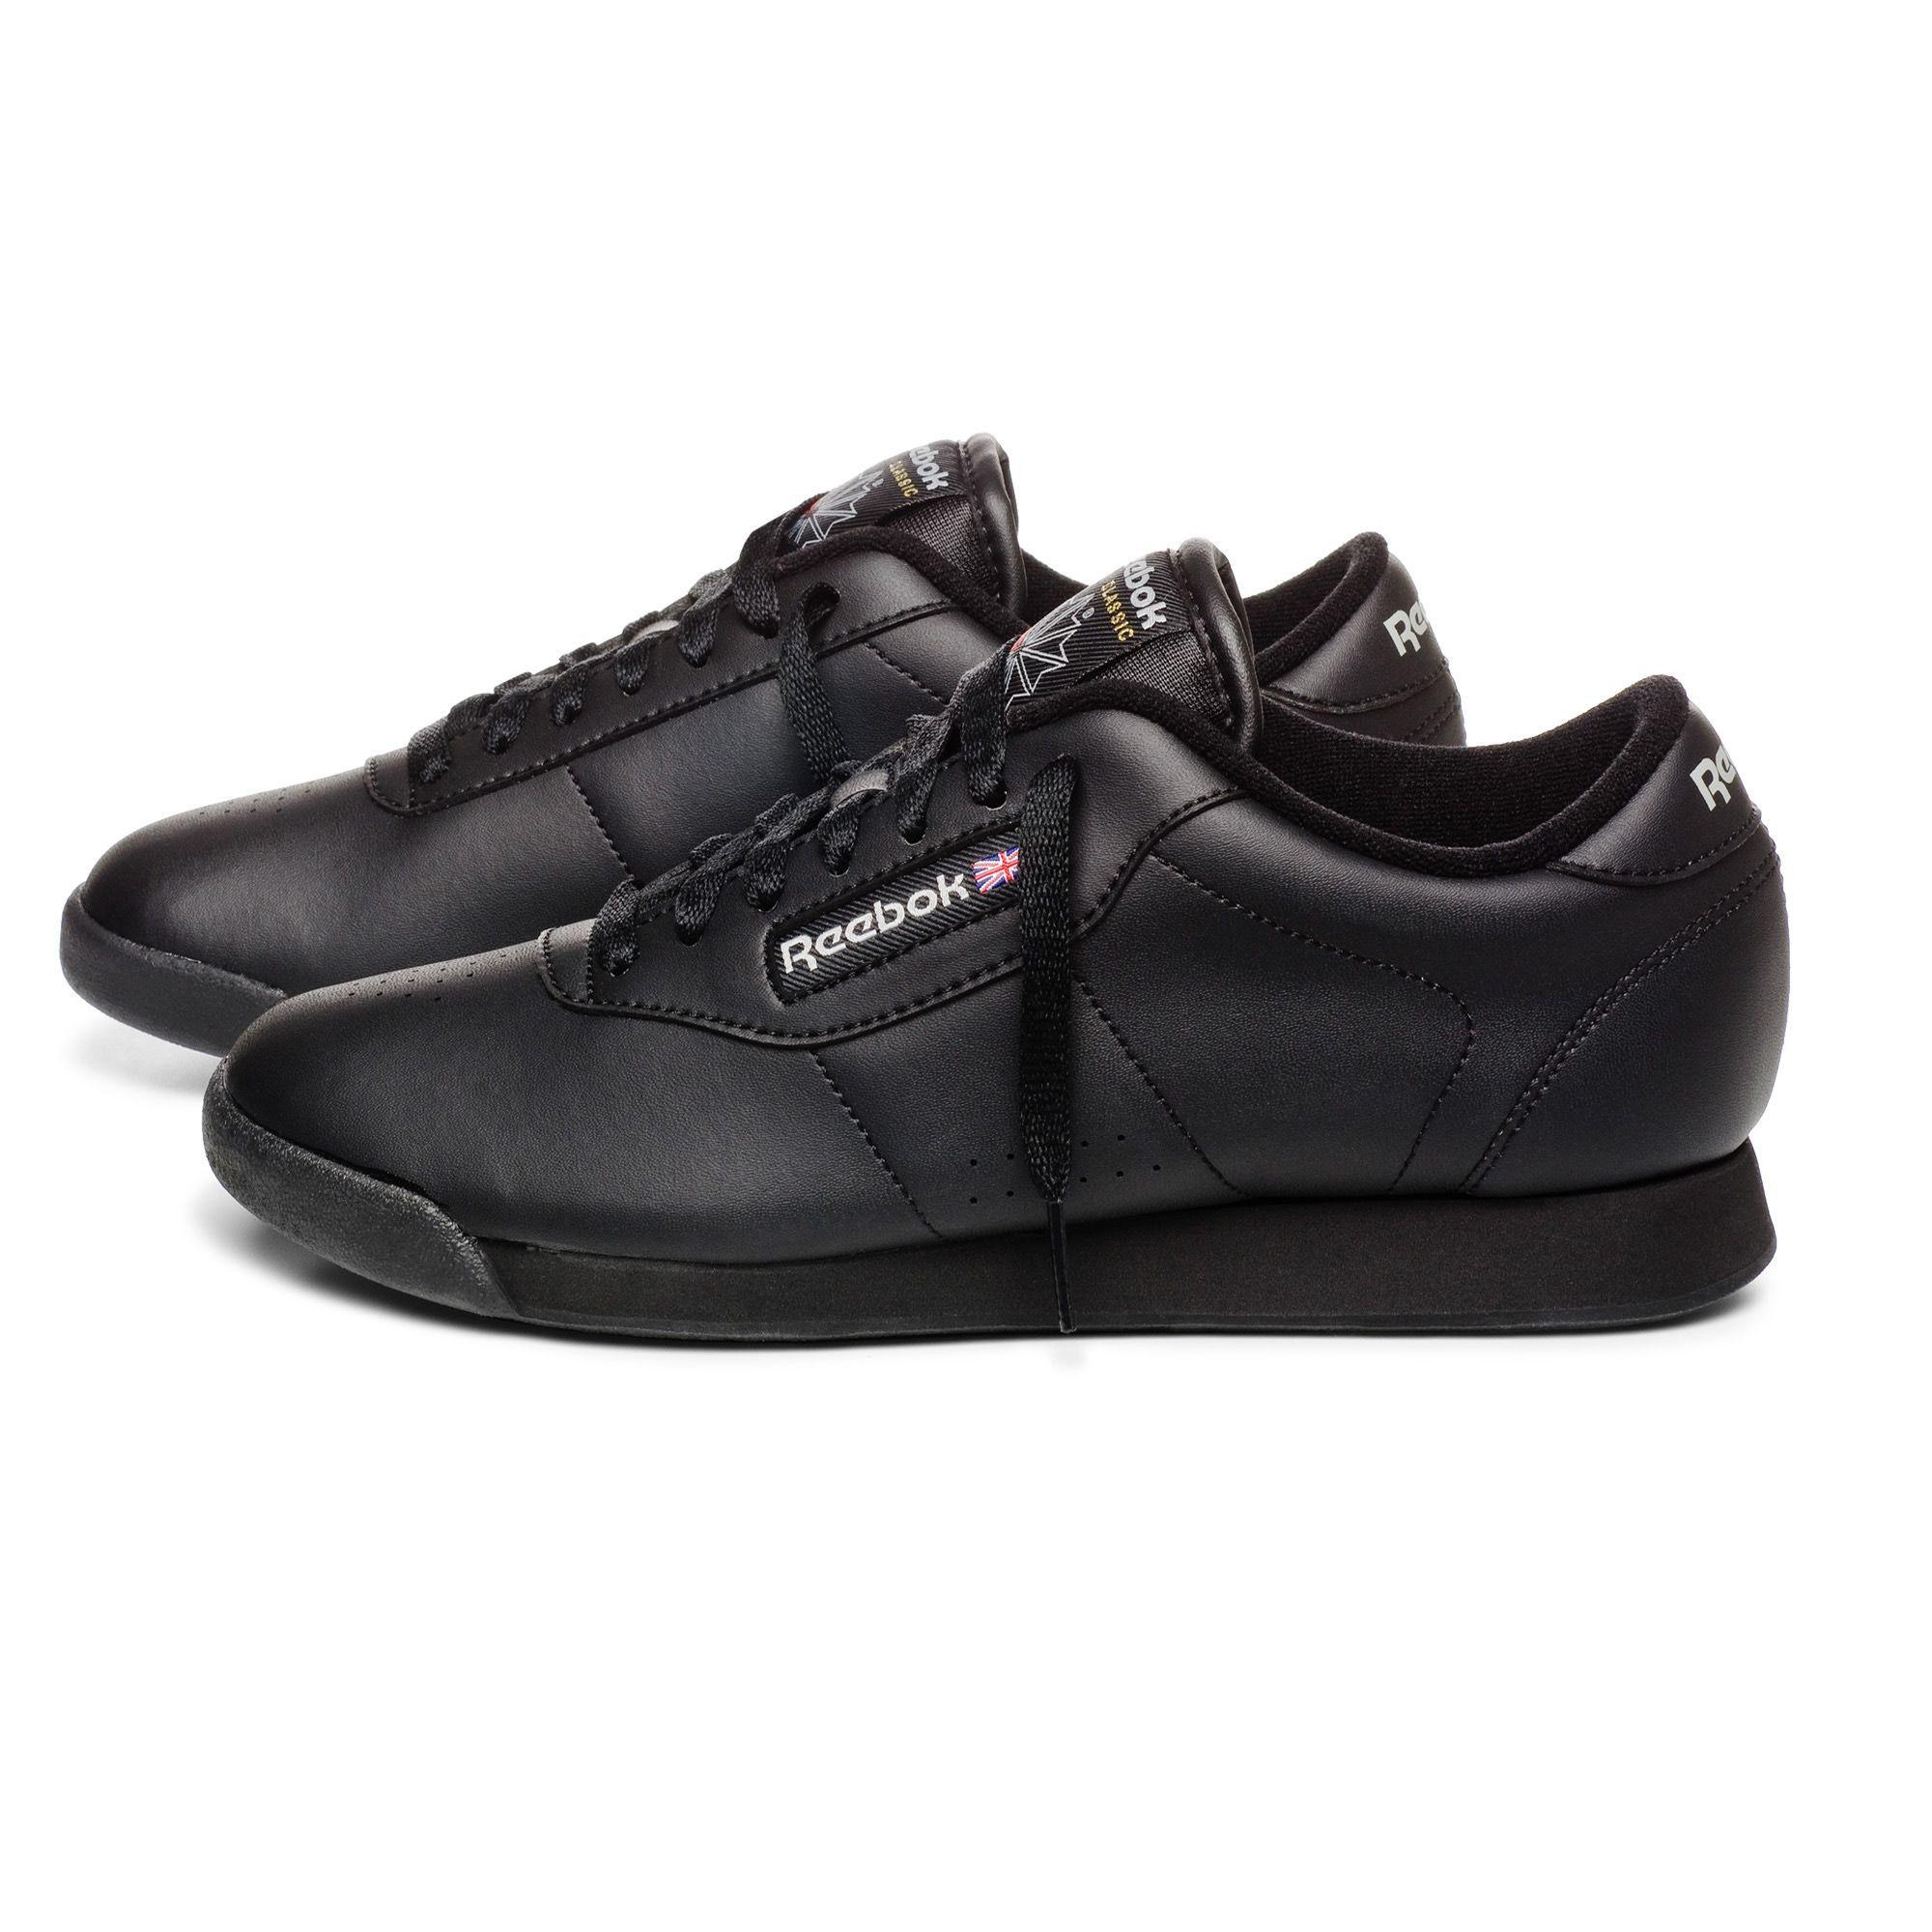 2d69926f856 Reebok Princess - Black | Reebok GB | Zapatos!! ♡ in 2019 | Reebok ...